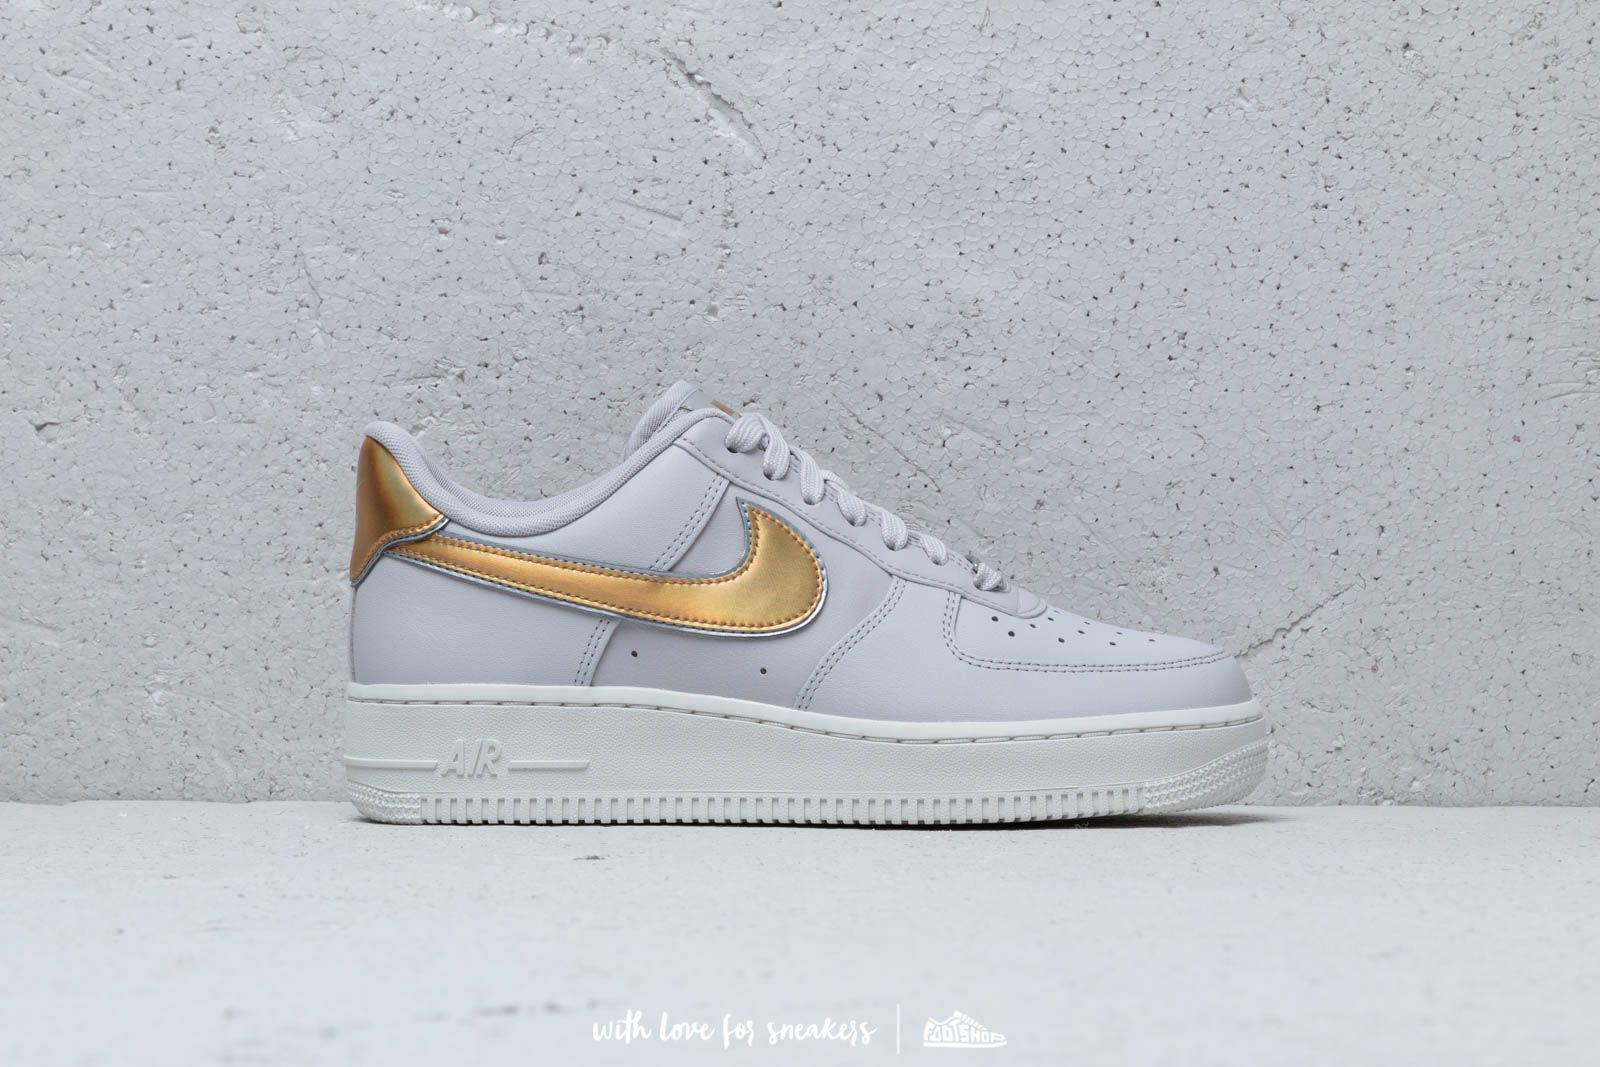 reputable site f6a61 cc1c2 Lyst - Nike Wmn s Air Force1  07 Metallic Vast Grey  Metallic Gold ...